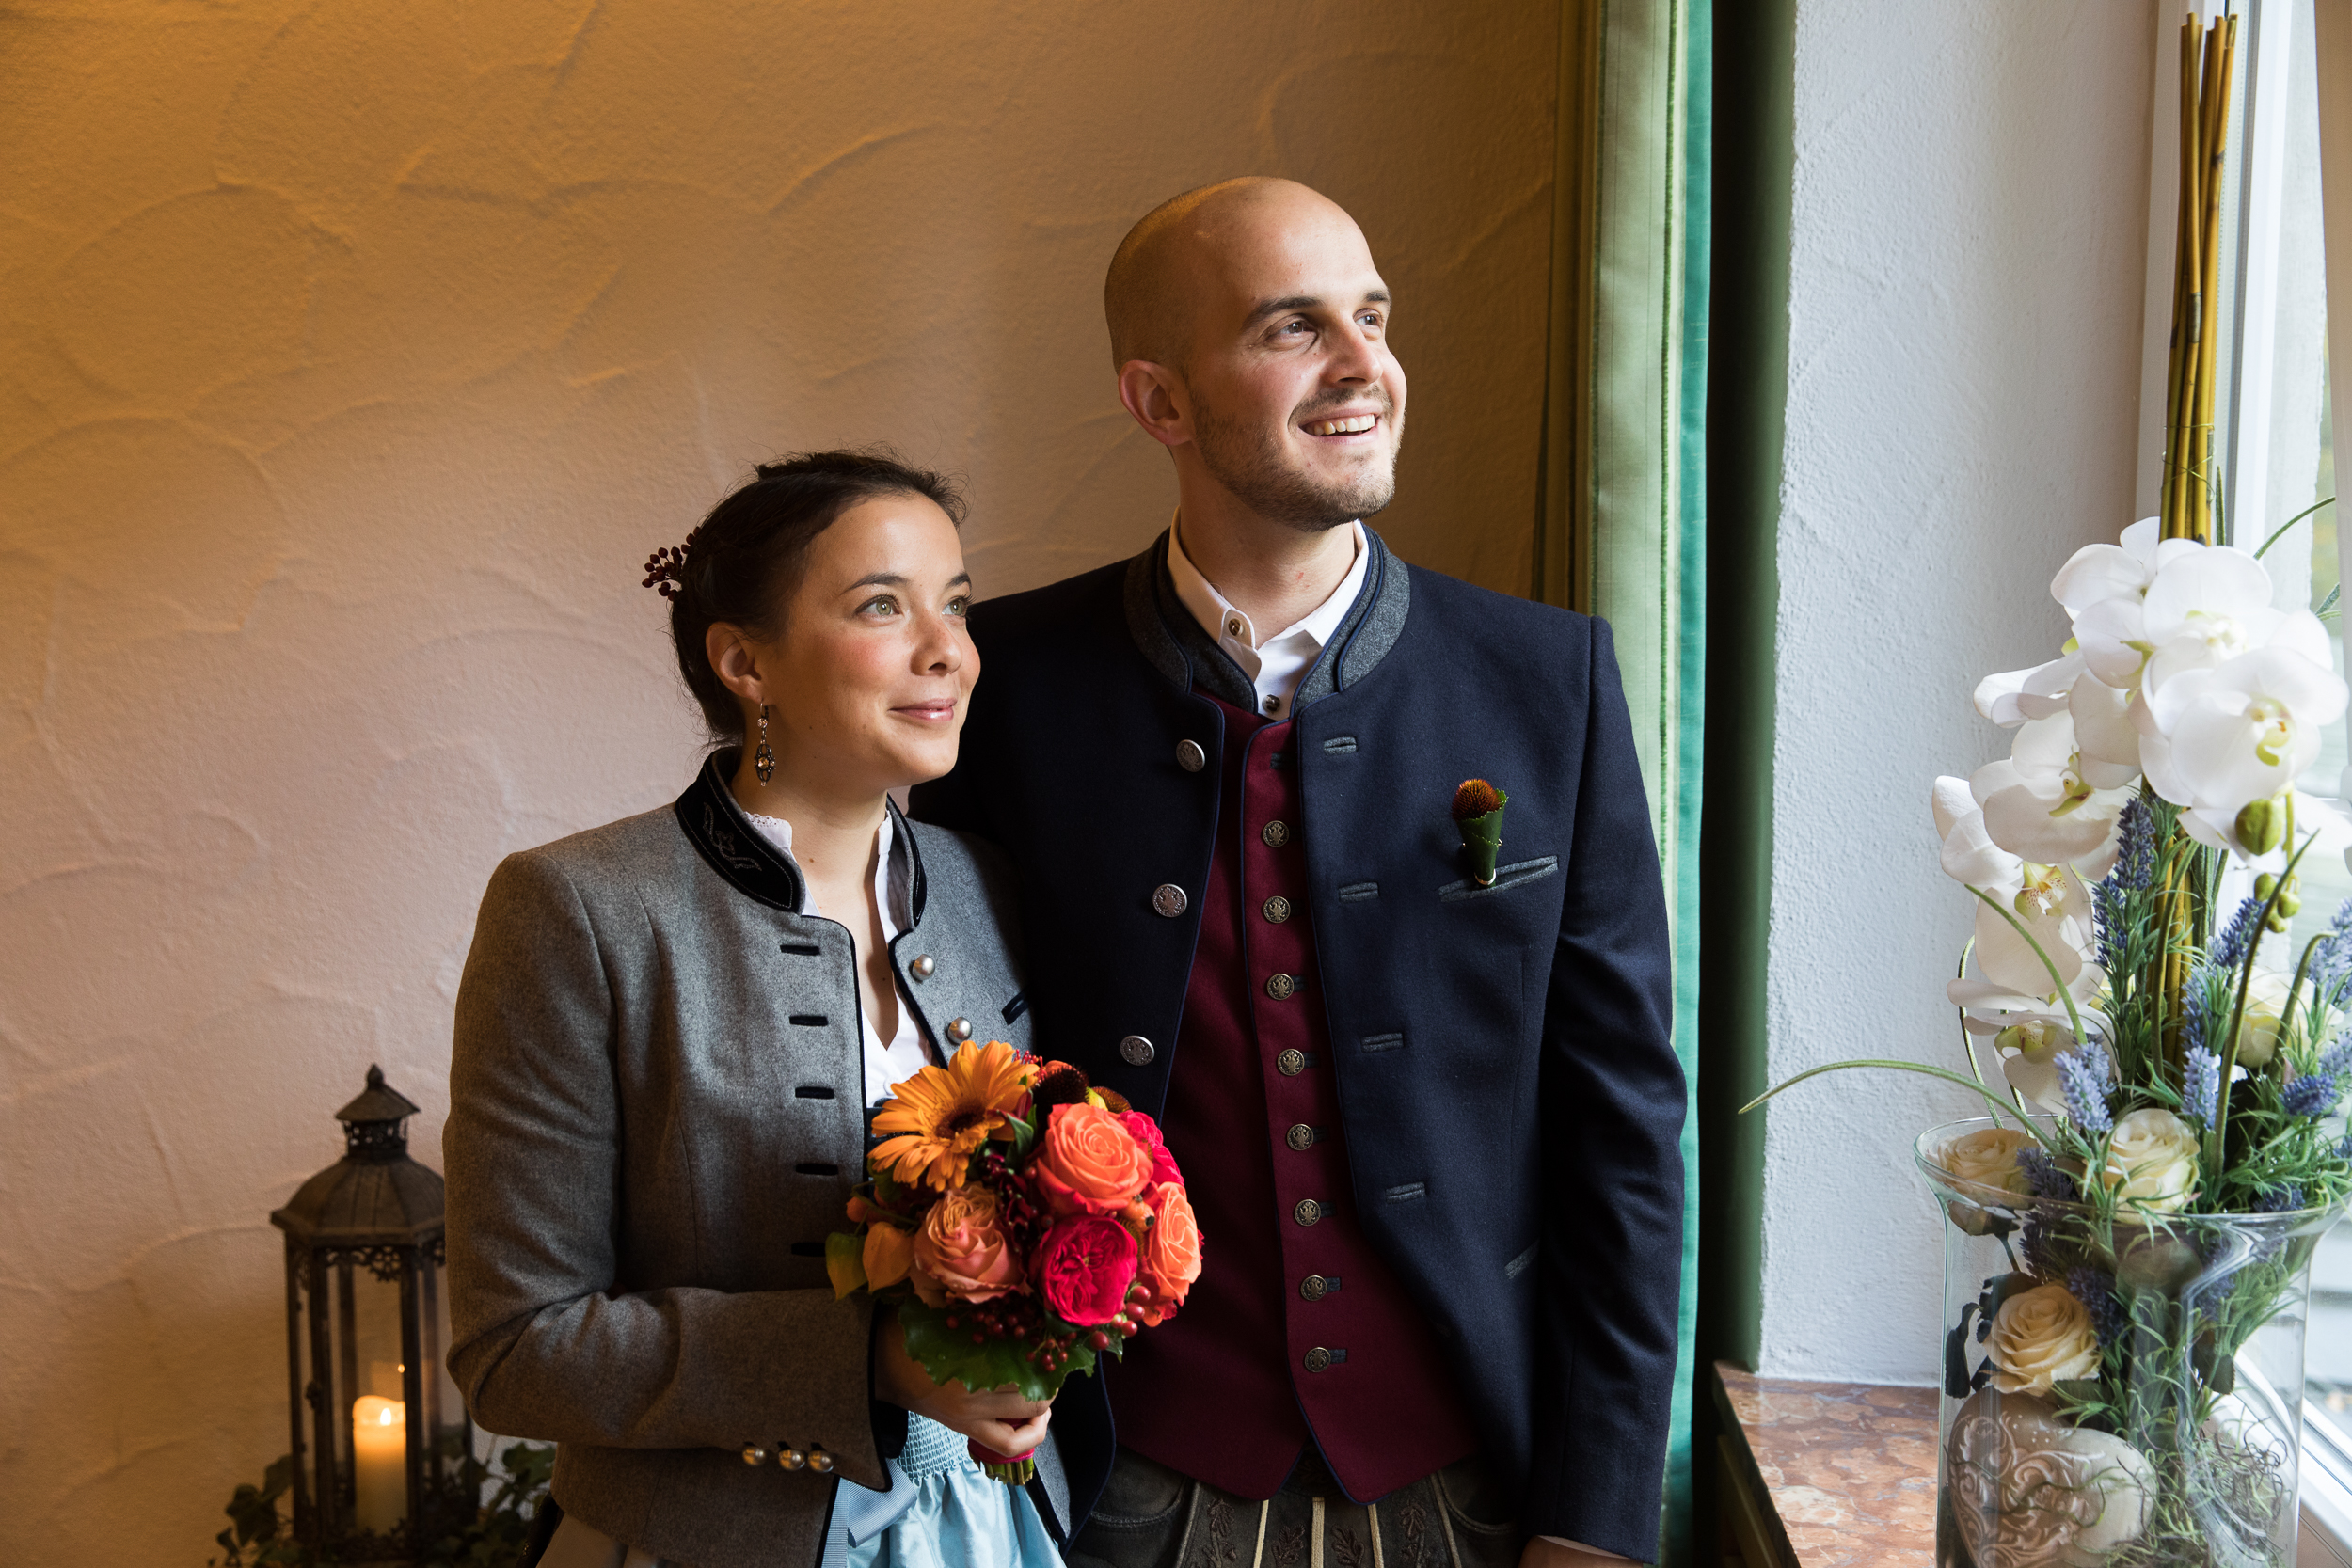 Gregg_Thorne_Wedding_Photographer_Munich_104.jpg